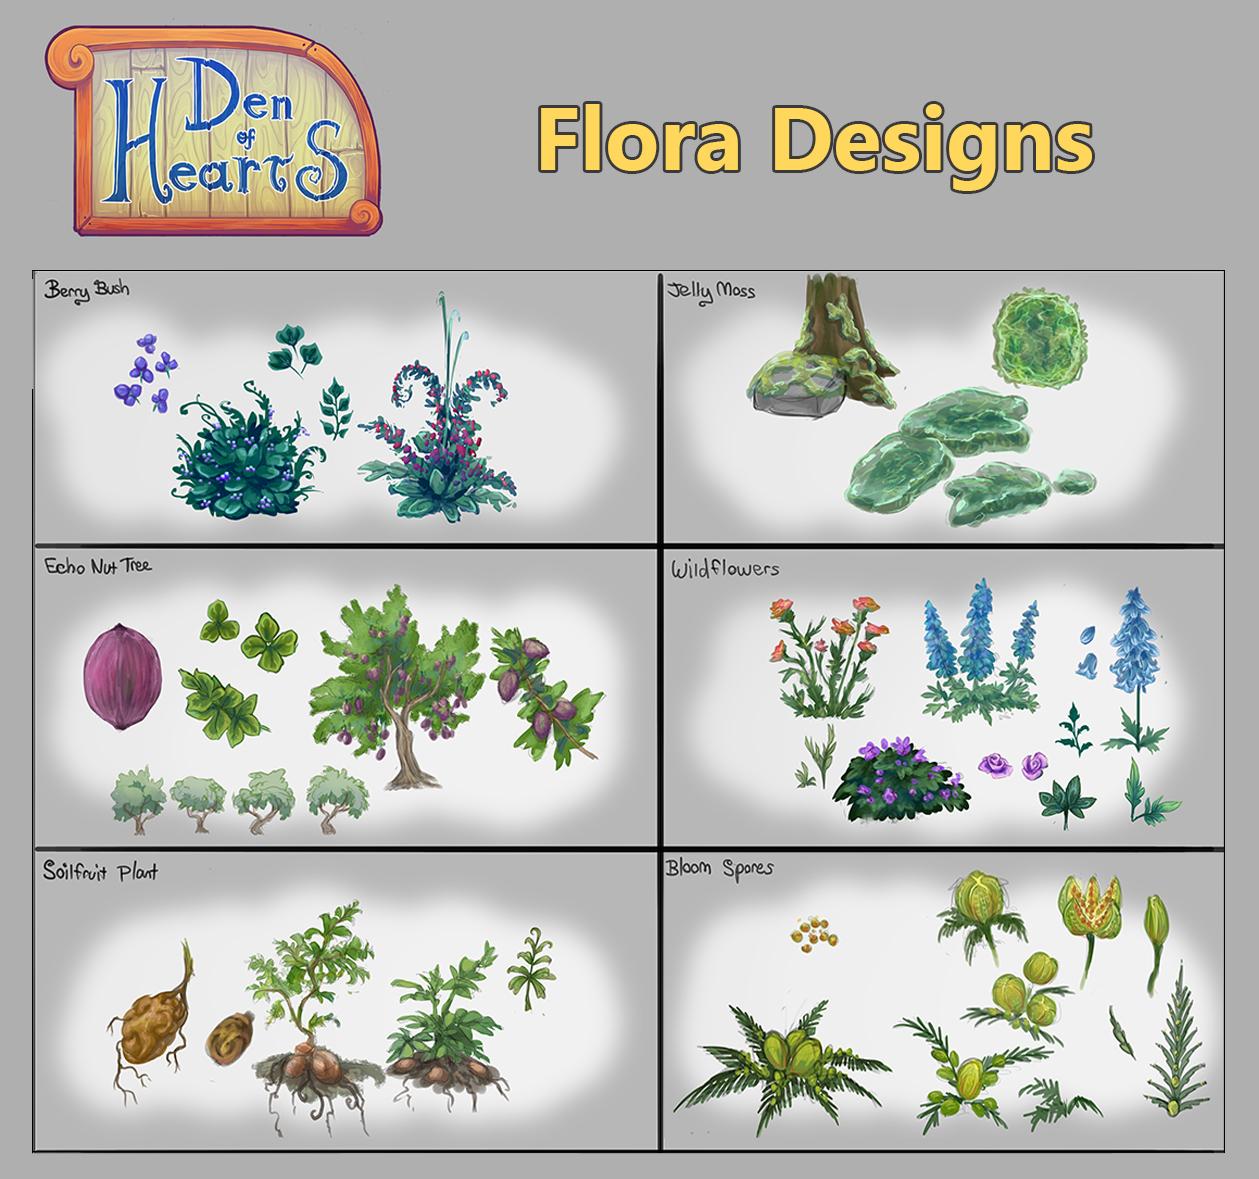 DOH FloraDesigns 2